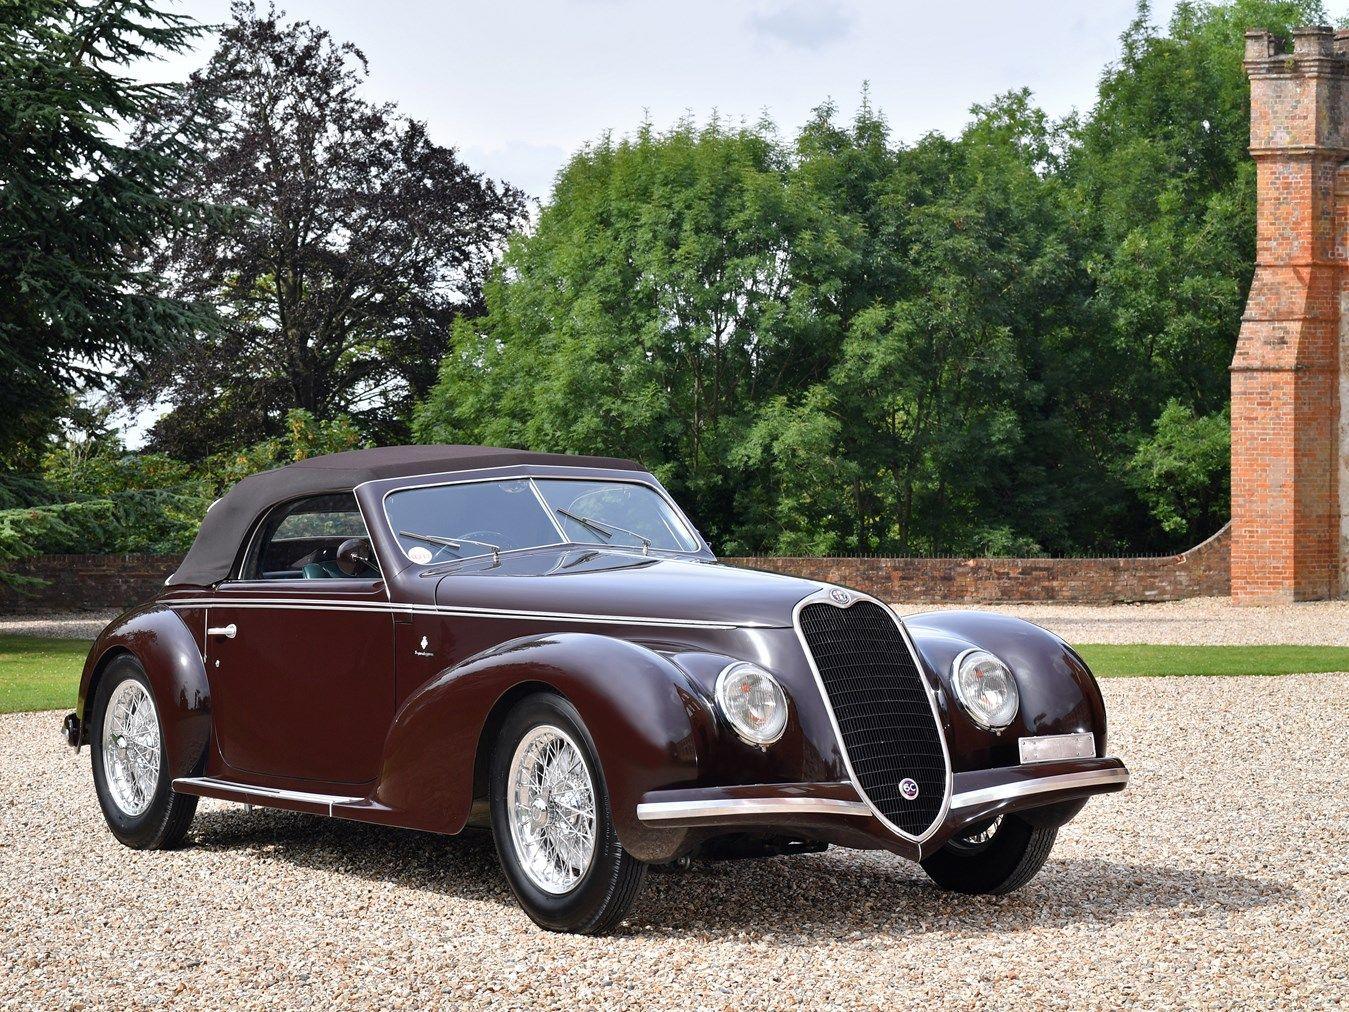 1939 Alfa Romeo 6c 2500 Sport Cabriolet By Touring Alfa Romeo